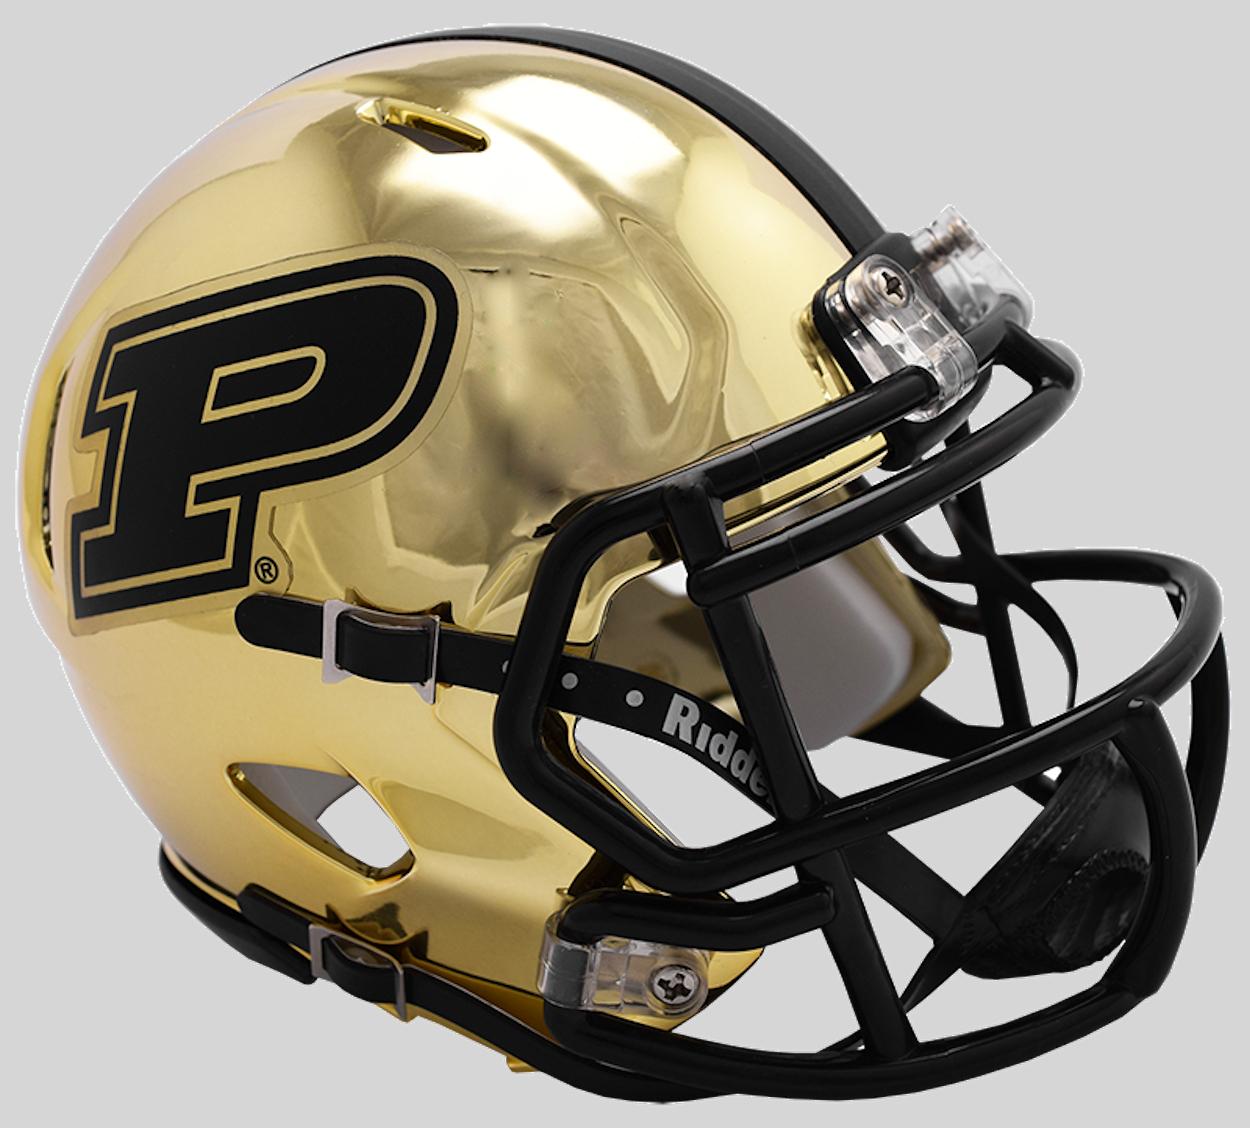 Purdue Boilermakers NCAA Mini Chrome Speed Football Helmet <B>NEW 2018 Chrome</B>